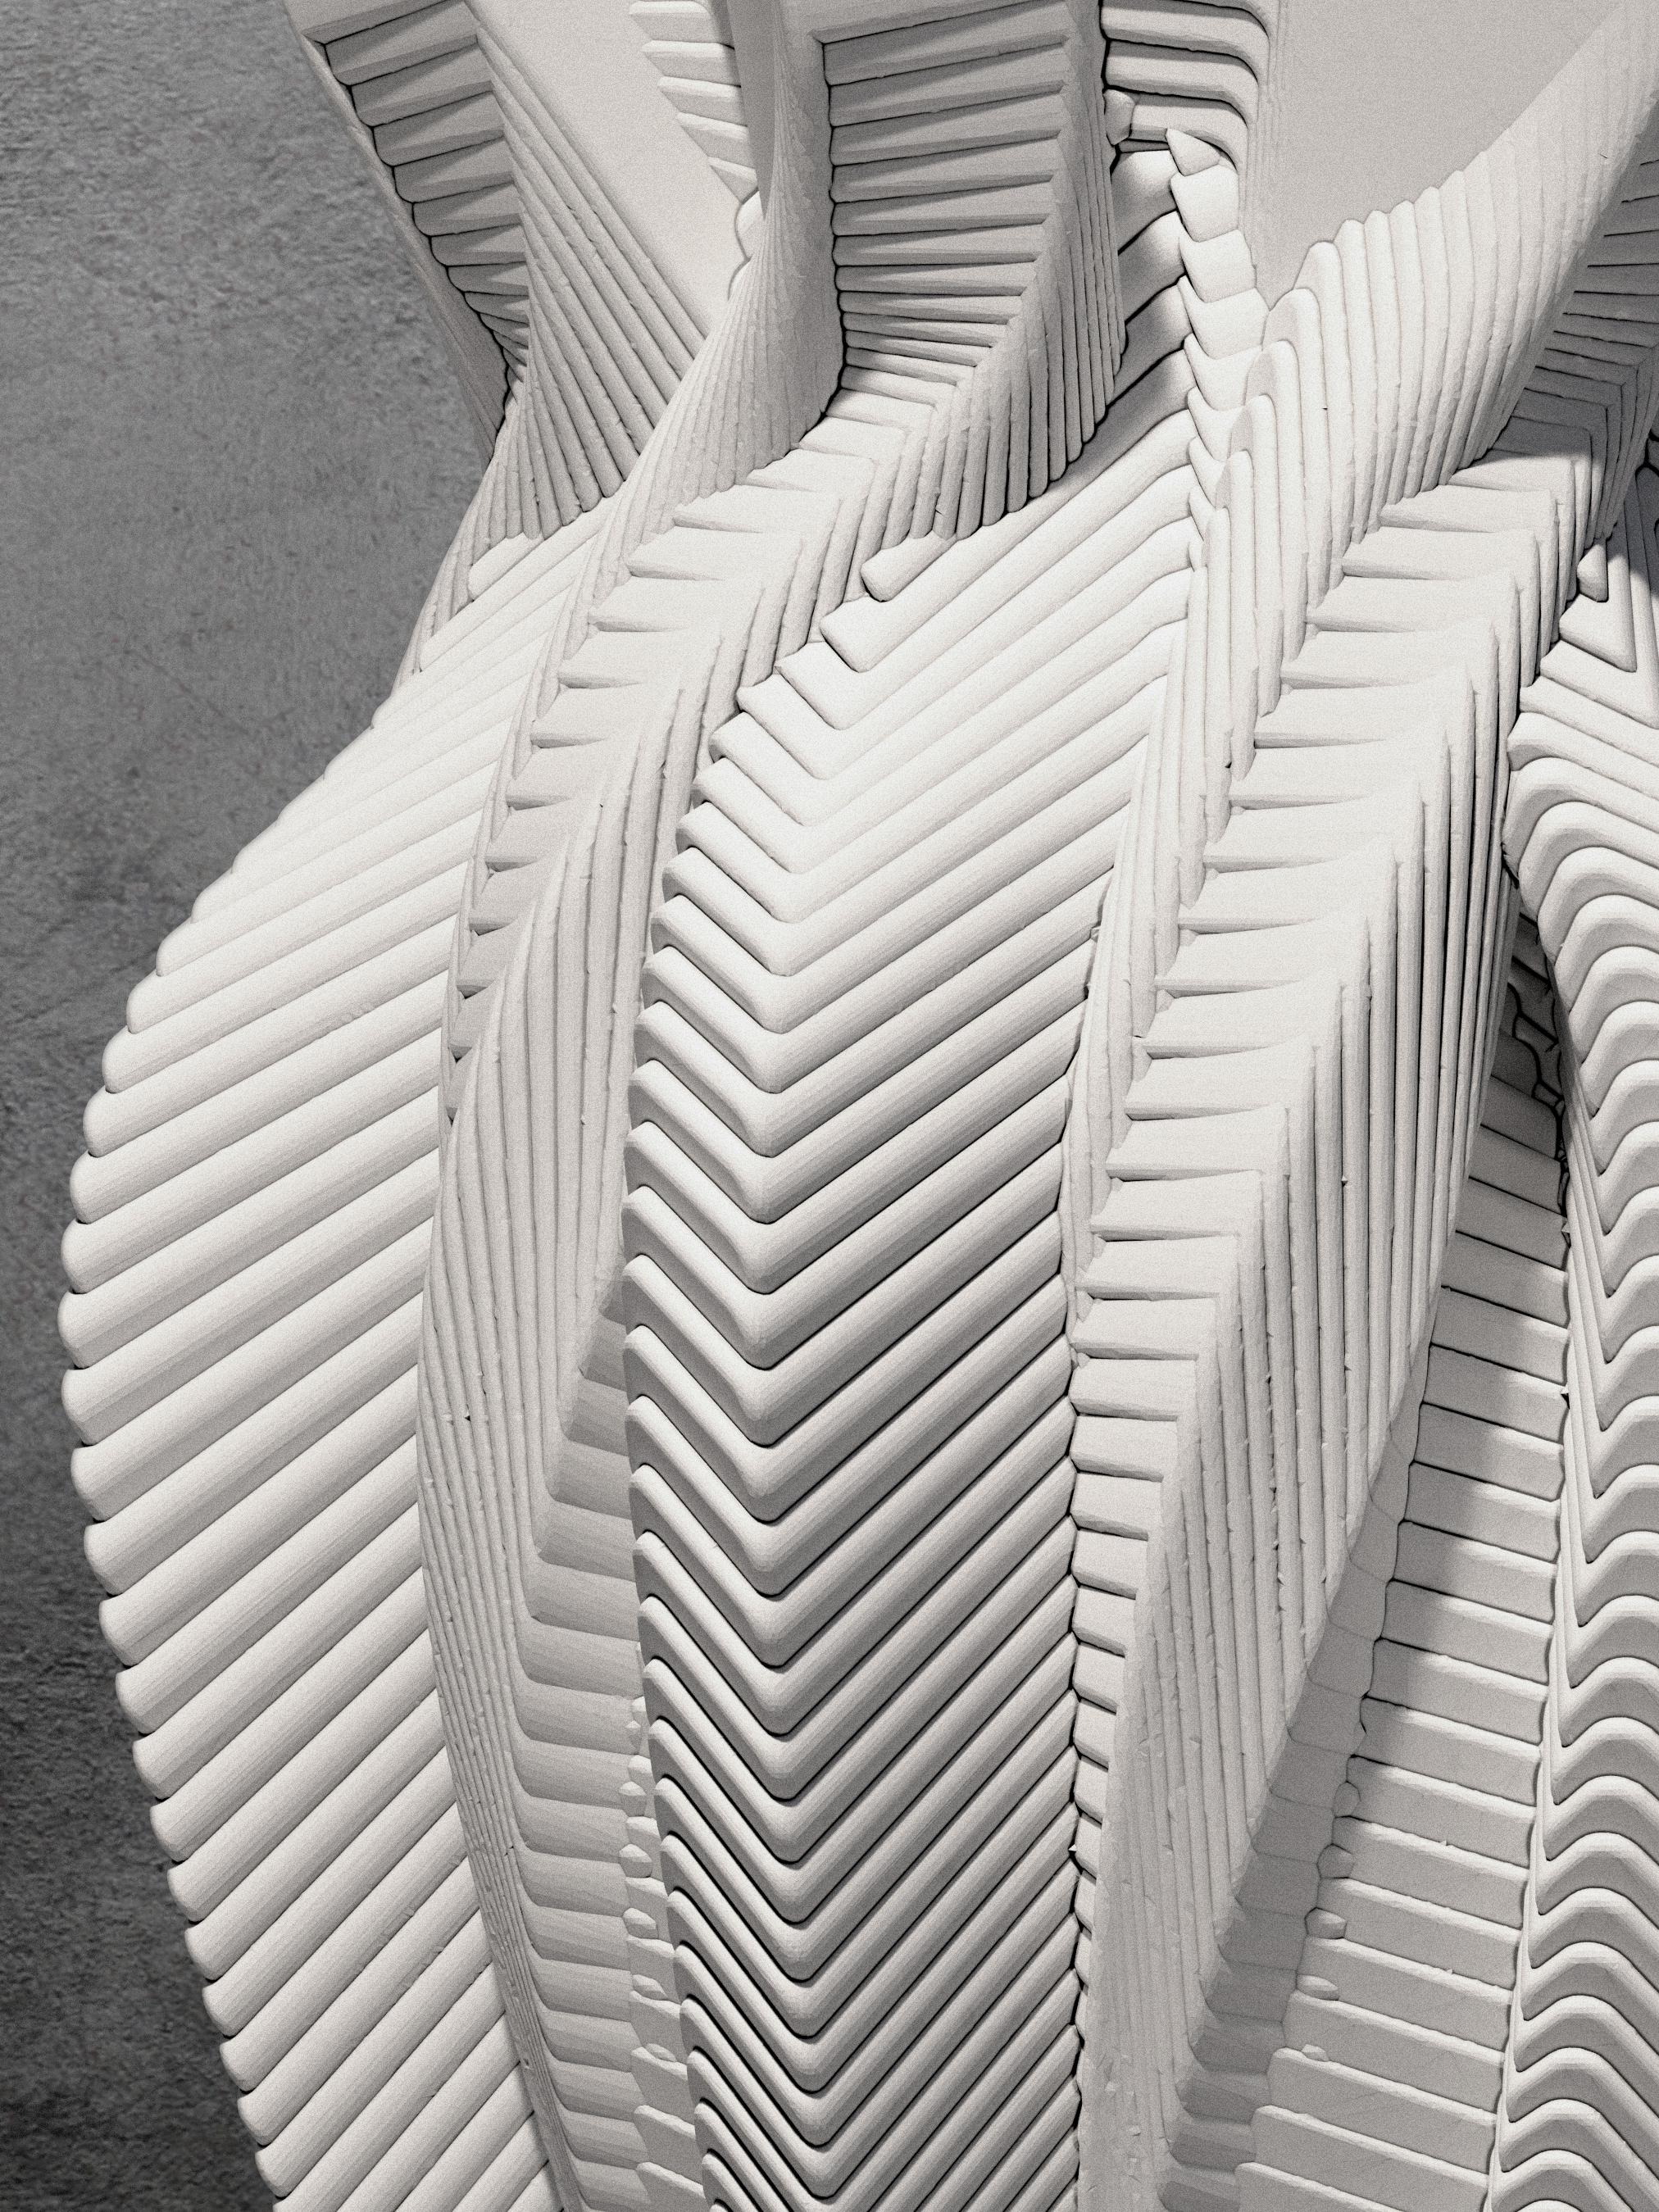 Vase A - Close Up